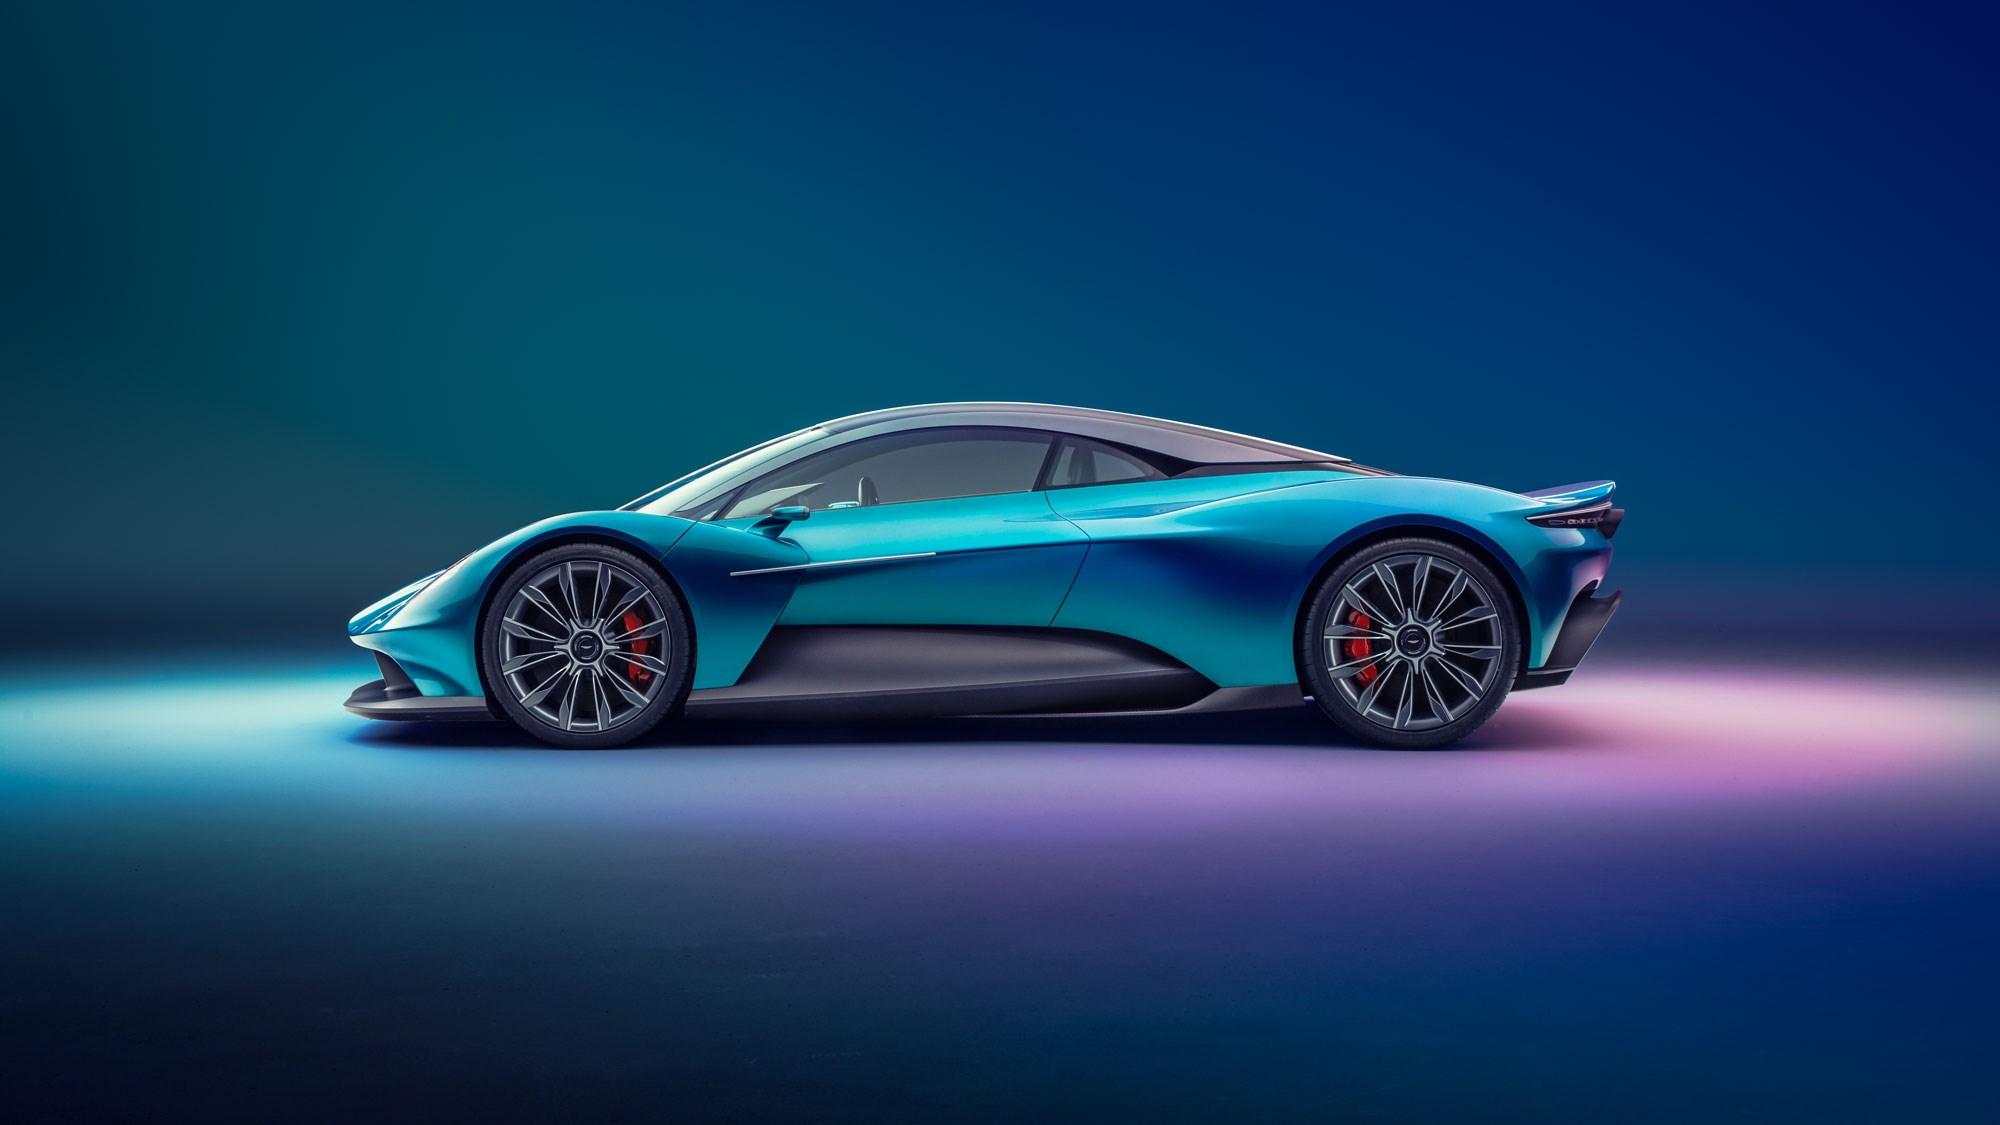 2021 Aston Martin Vanquish Review